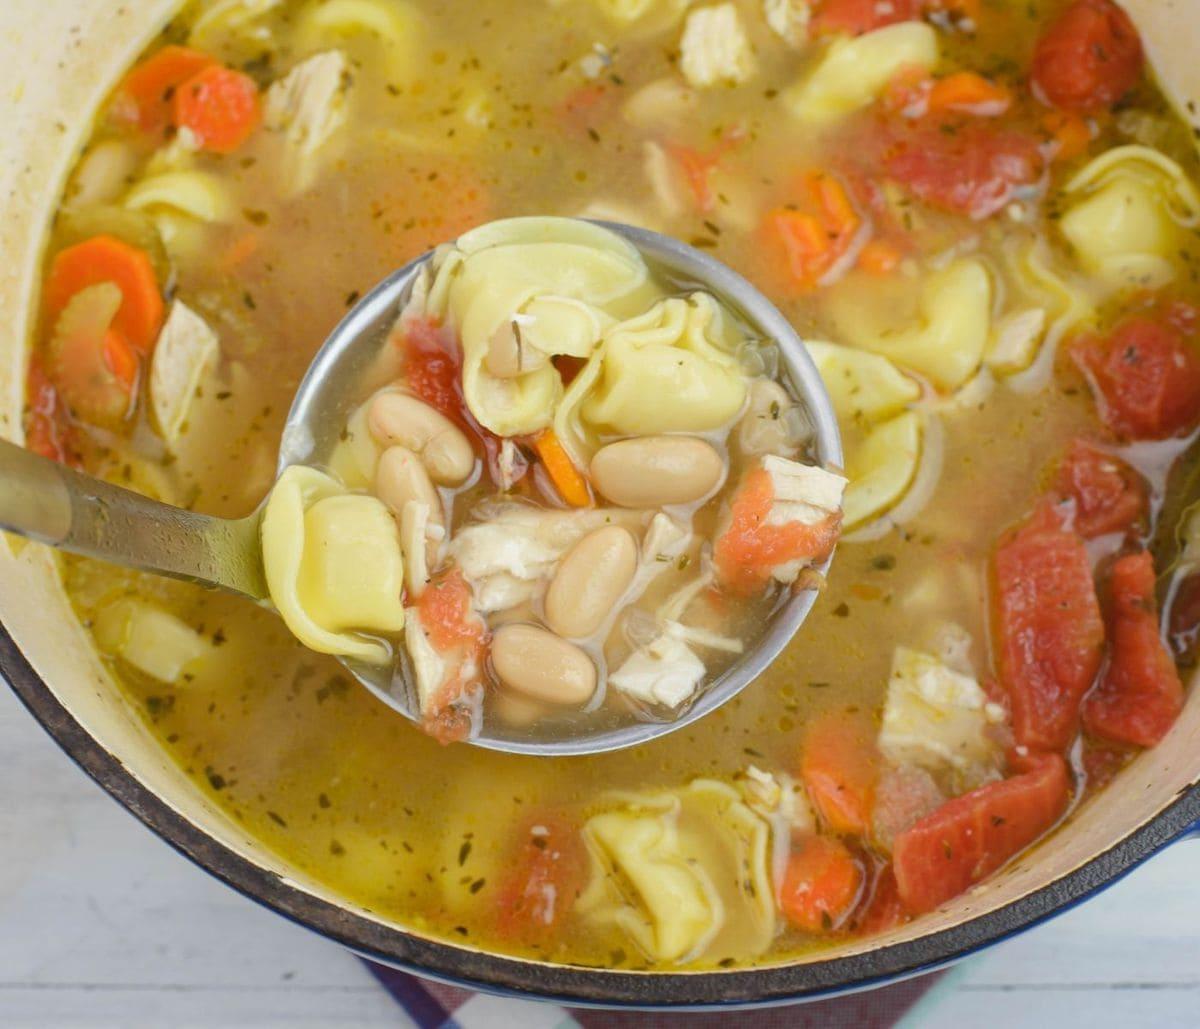 Closeup of a ladle full of soup.